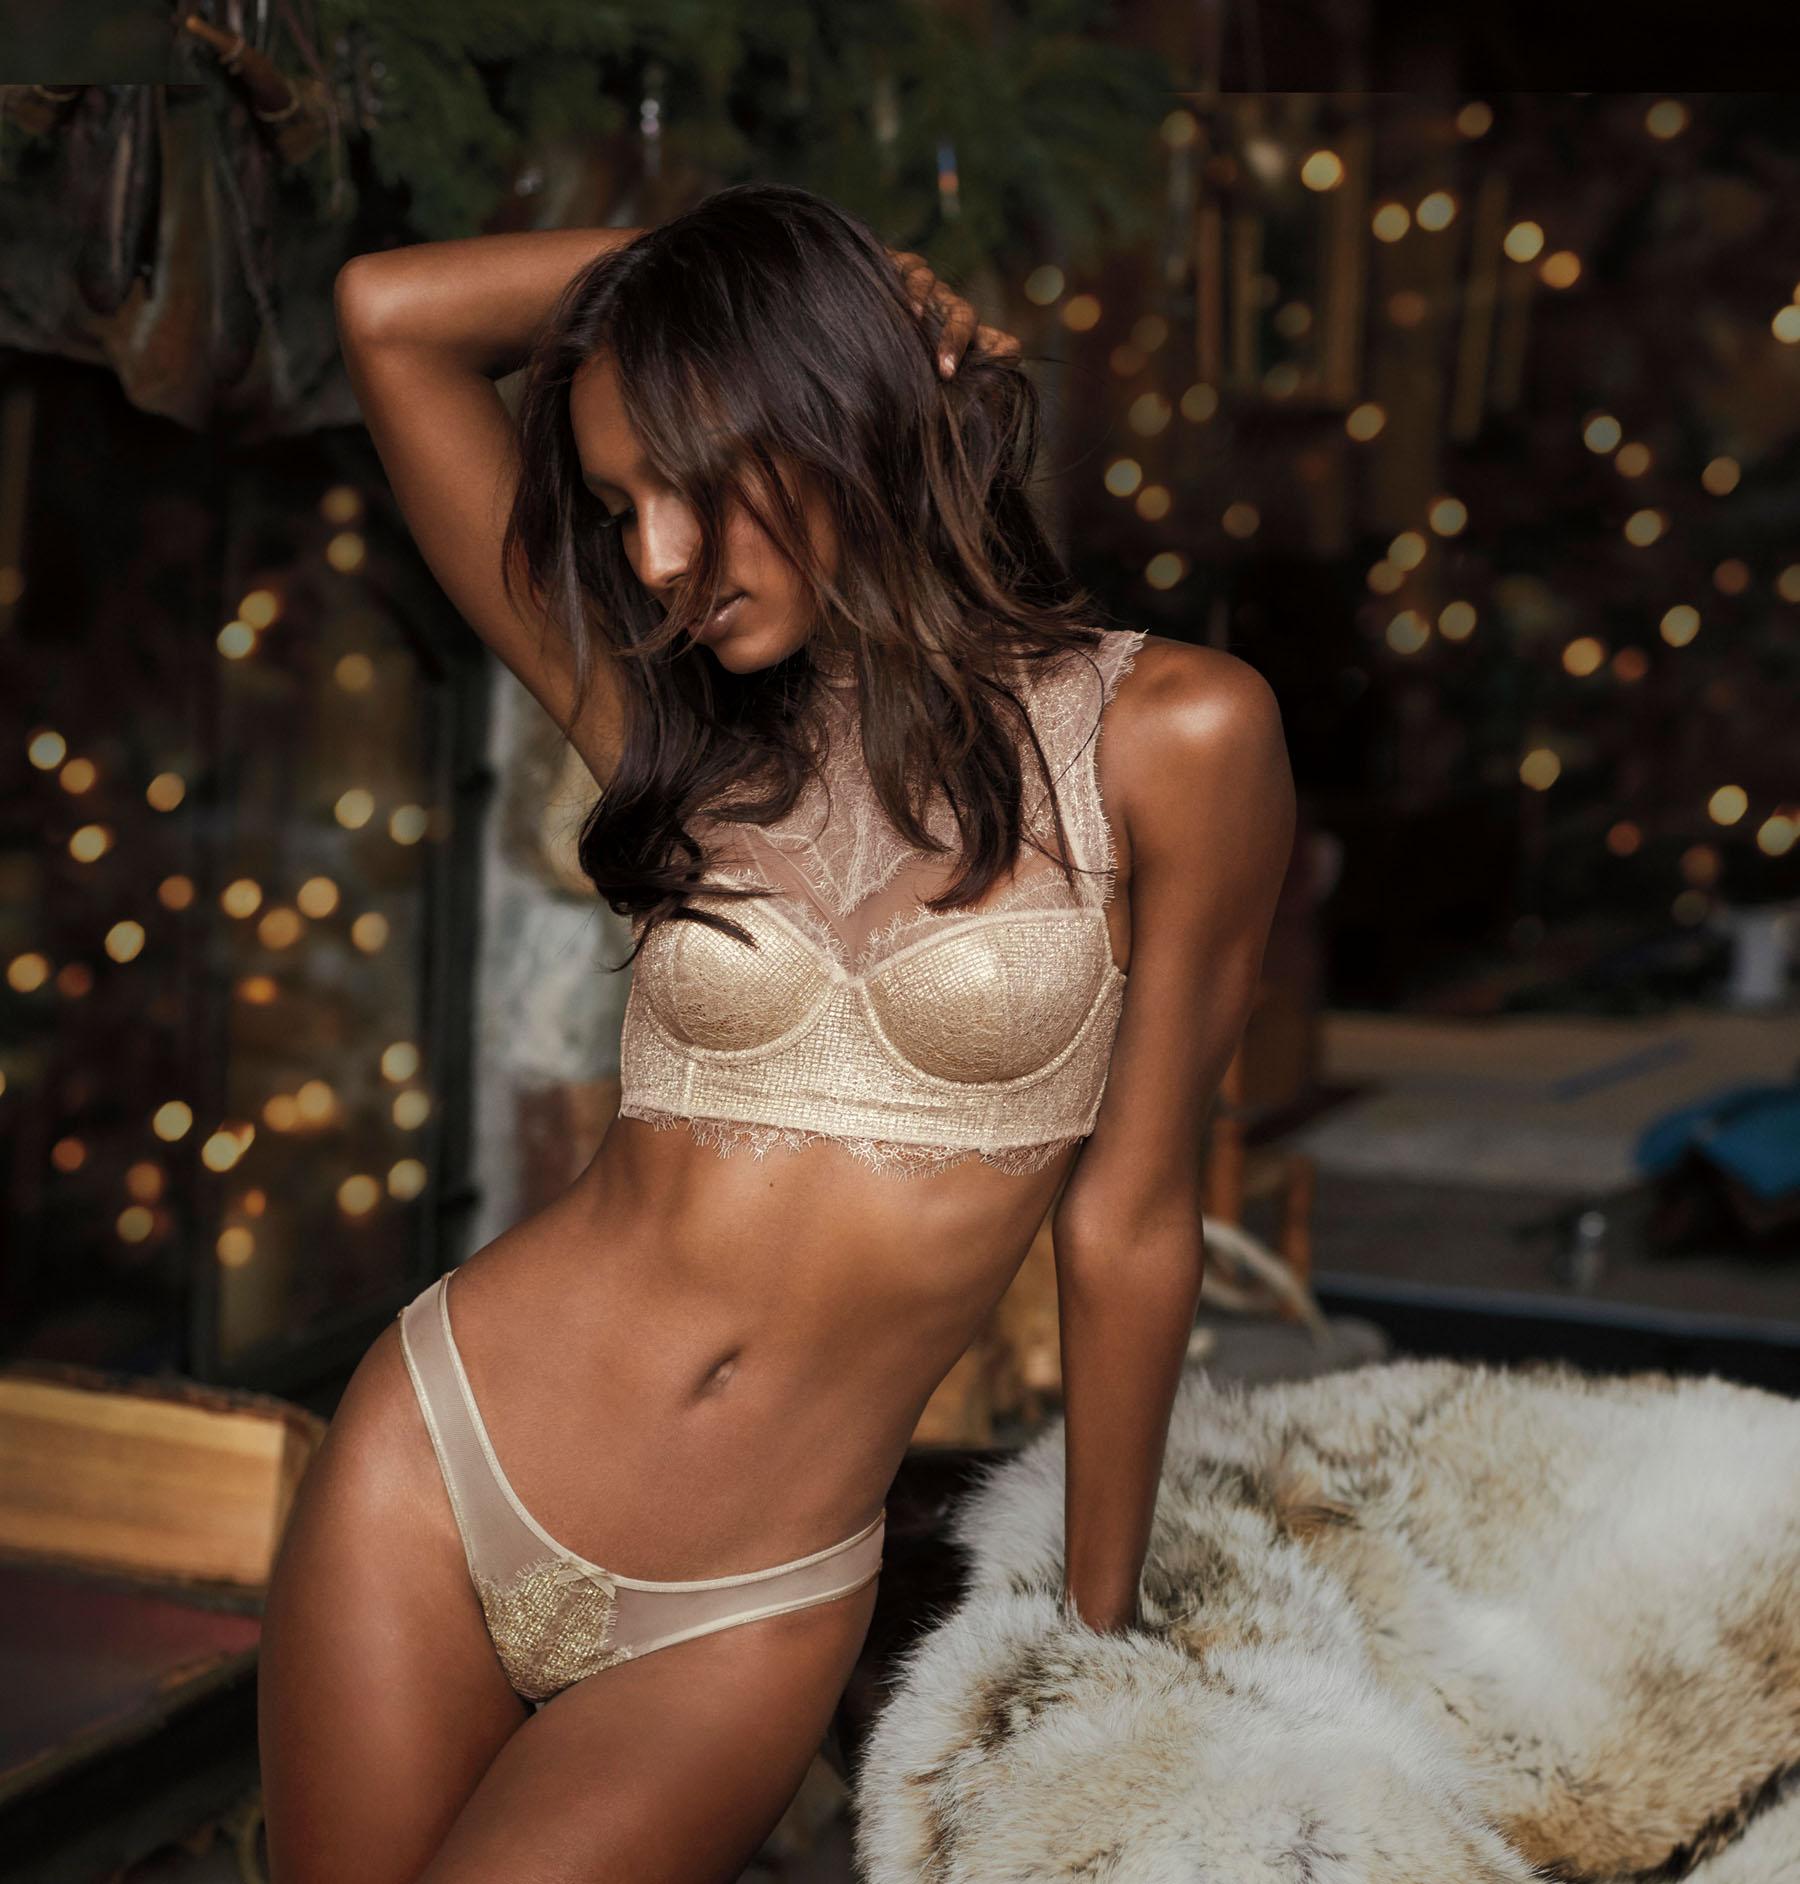 Victorias-Secret-holiday-2017-ad-campaign-the-impression-06